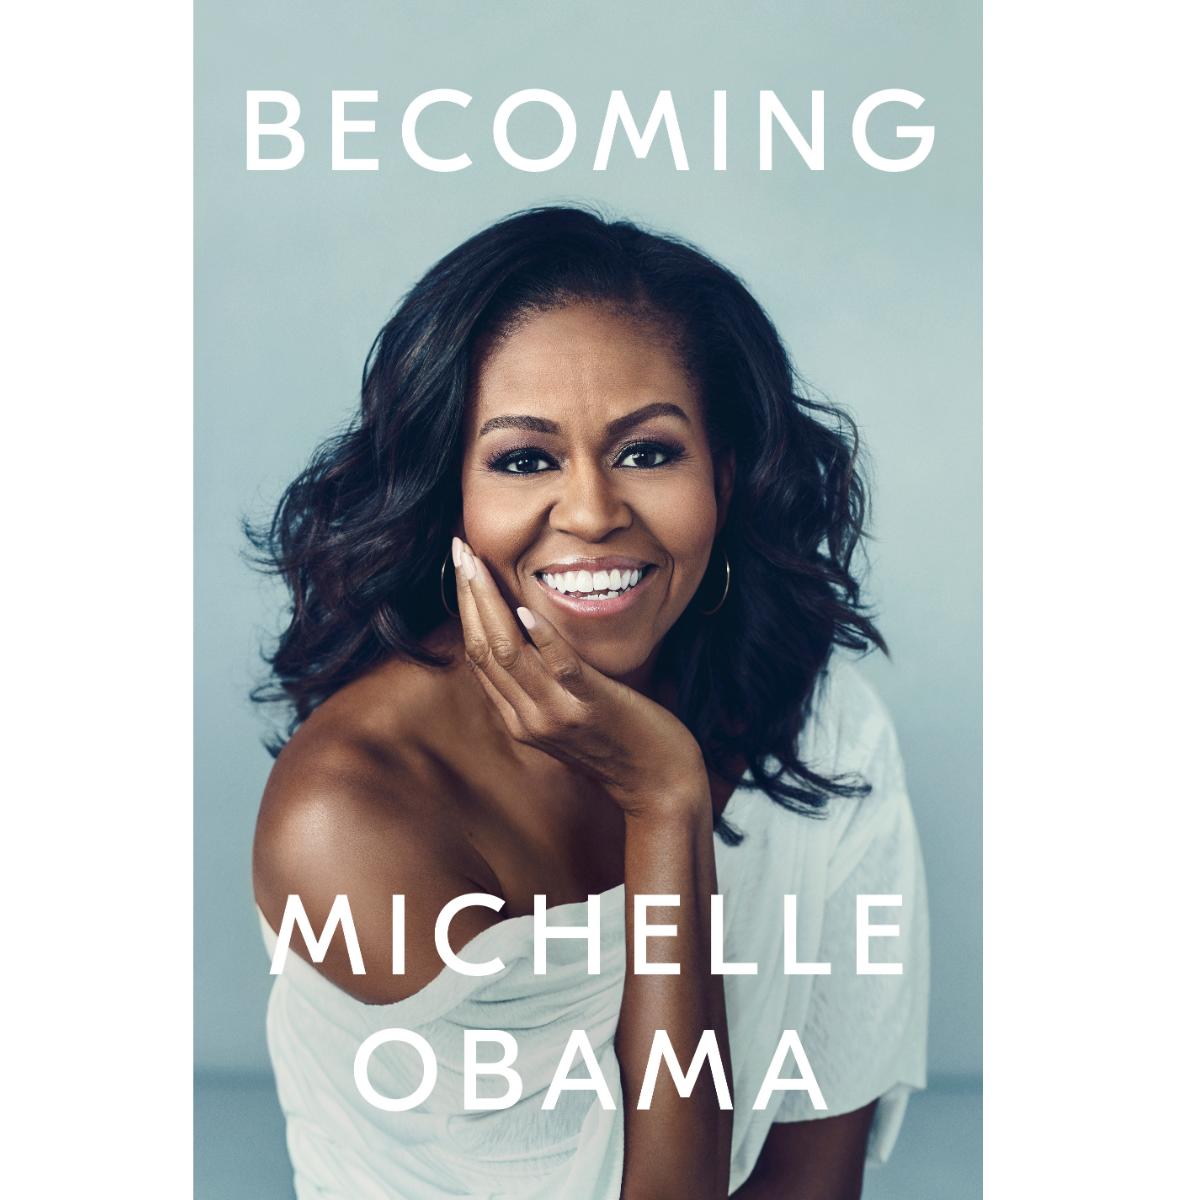 Book cover image courtesy of Random House Inc.